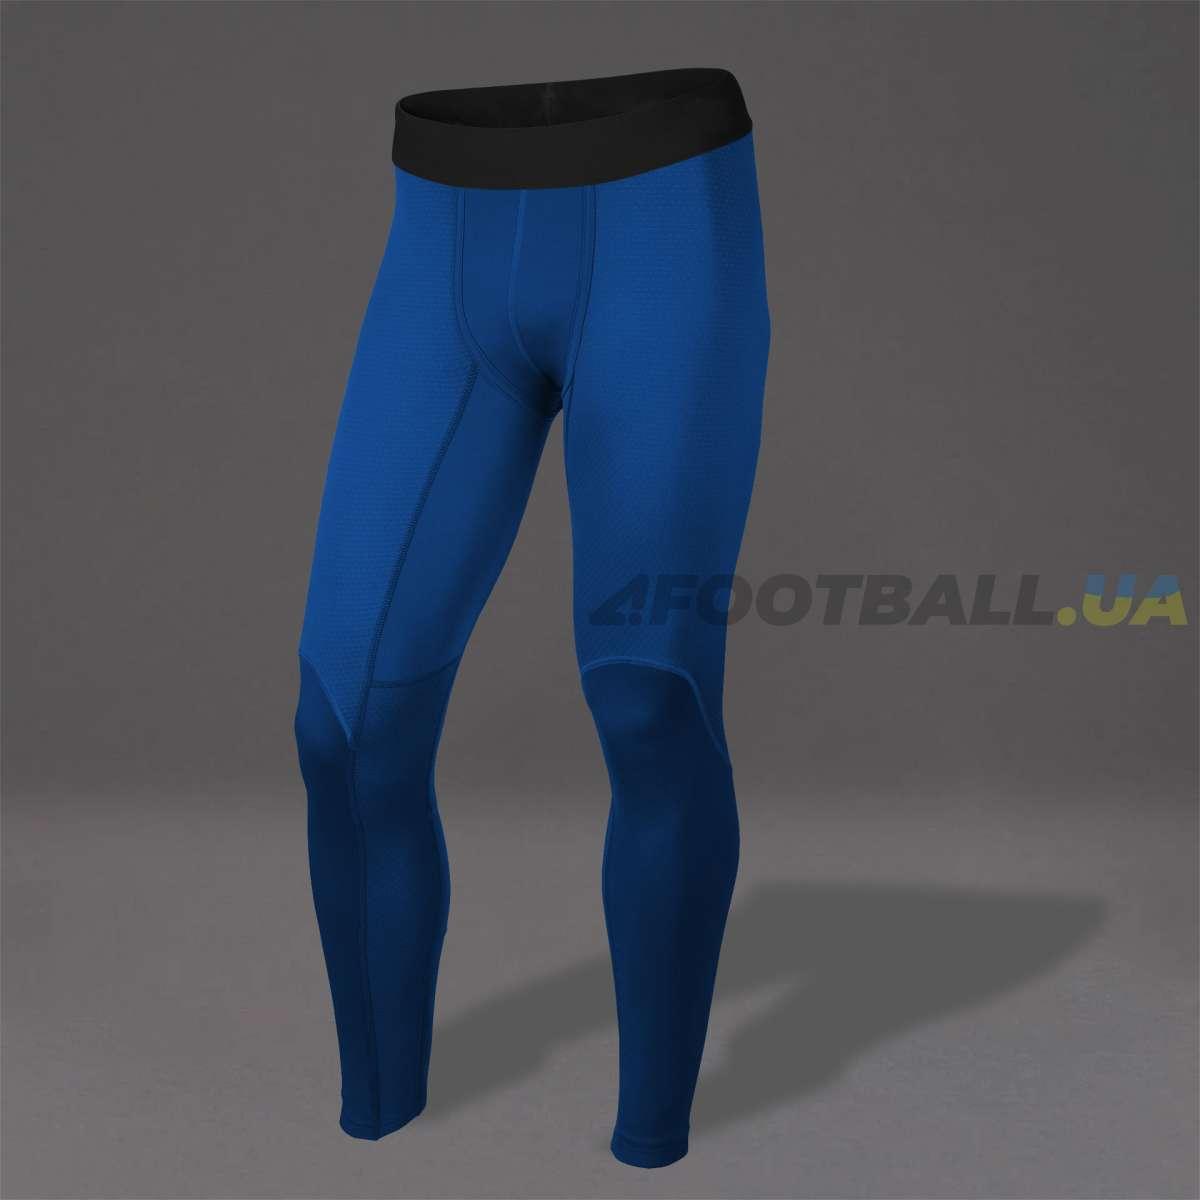 07475db4fb57 Компрессионное термобелье штаны Nike PRO COMBAT HyperWarm Max Shield 2.0  Compression 824616-319